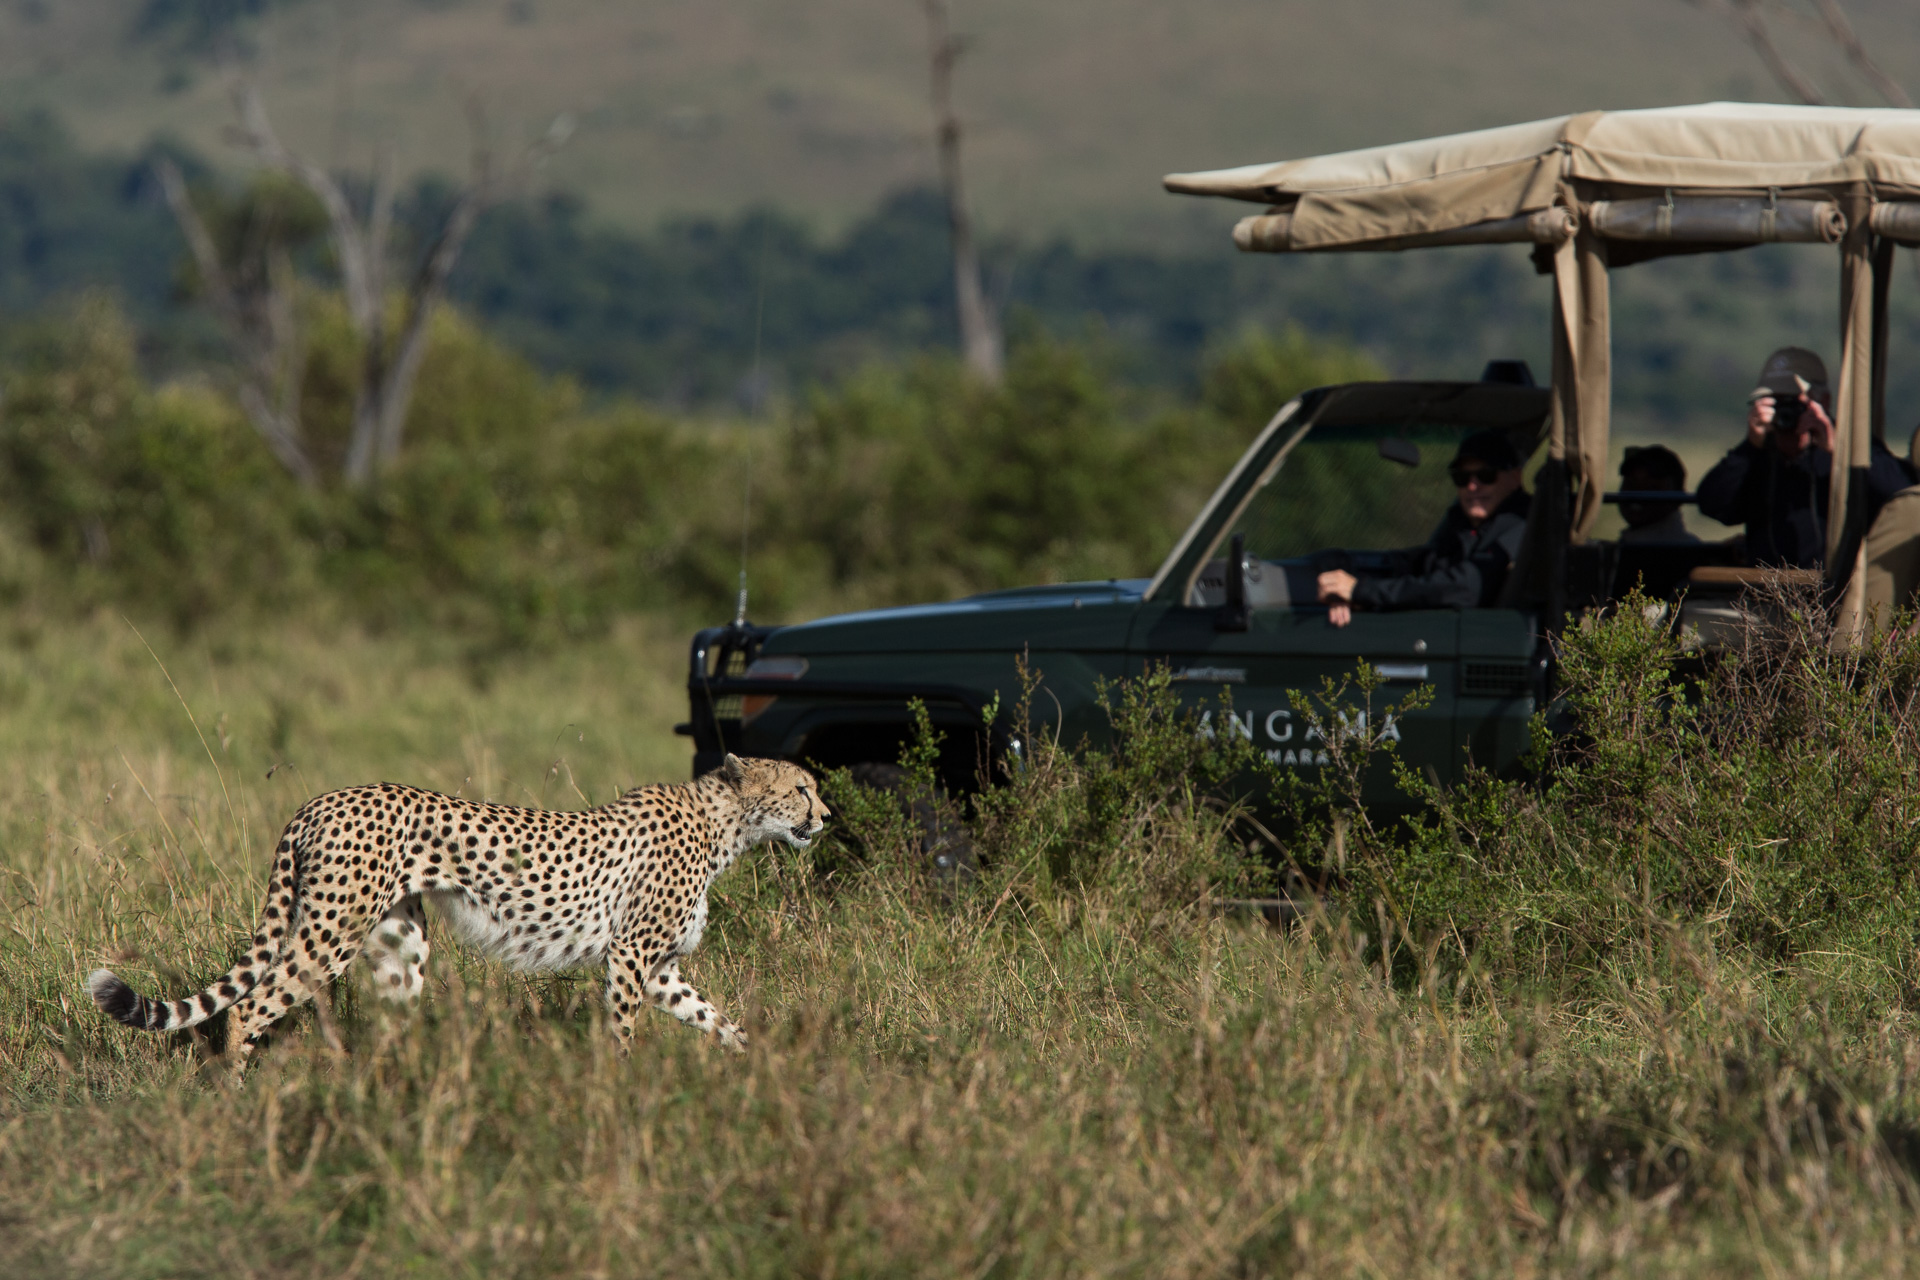 Cheetah & game vehicle